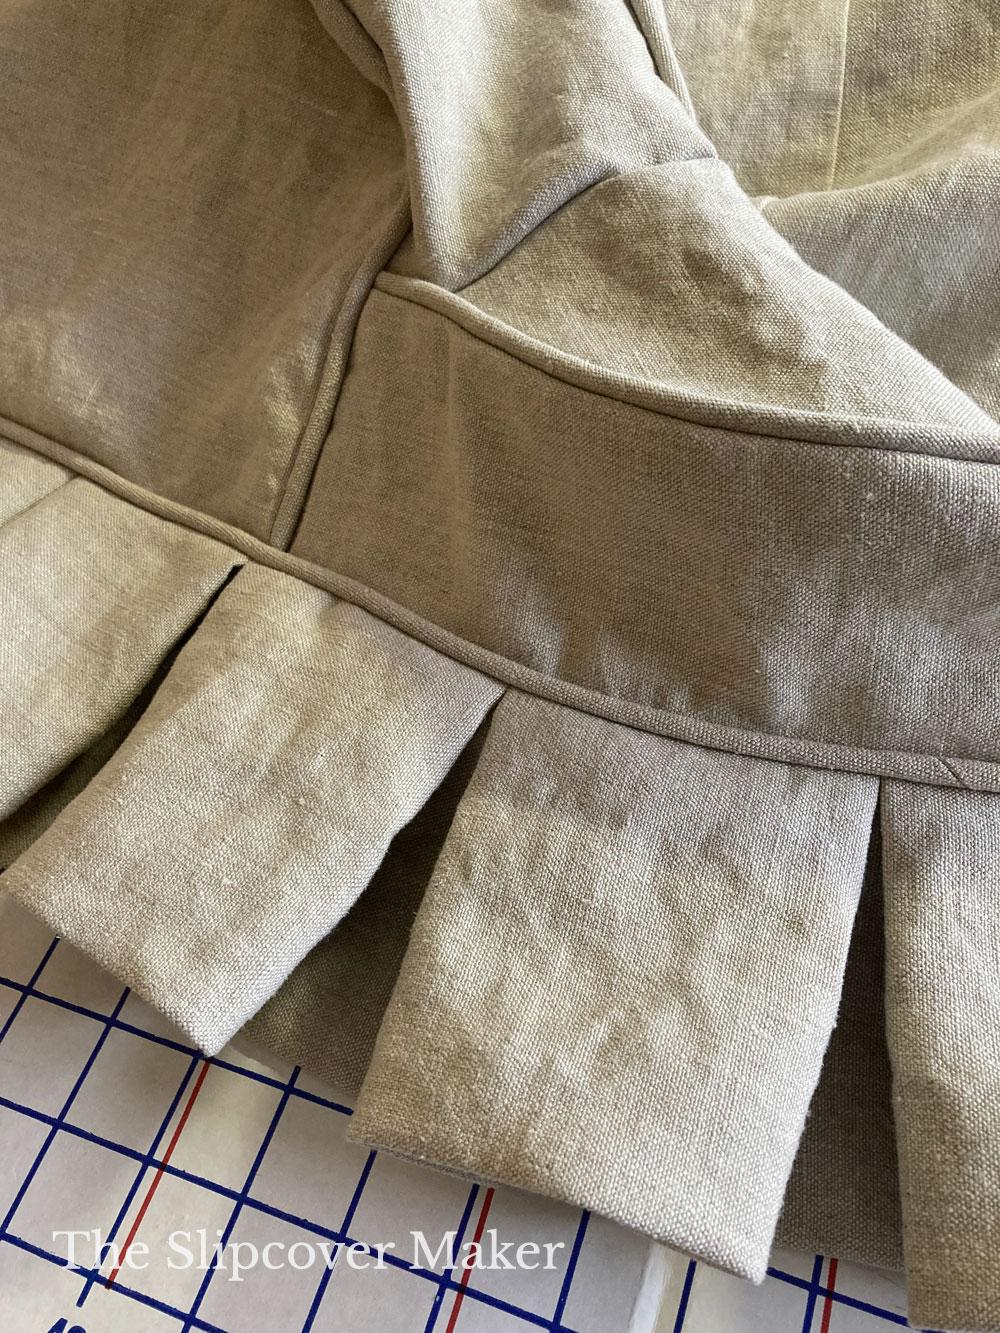 Box Pleat Hemp Slipcover Skirt